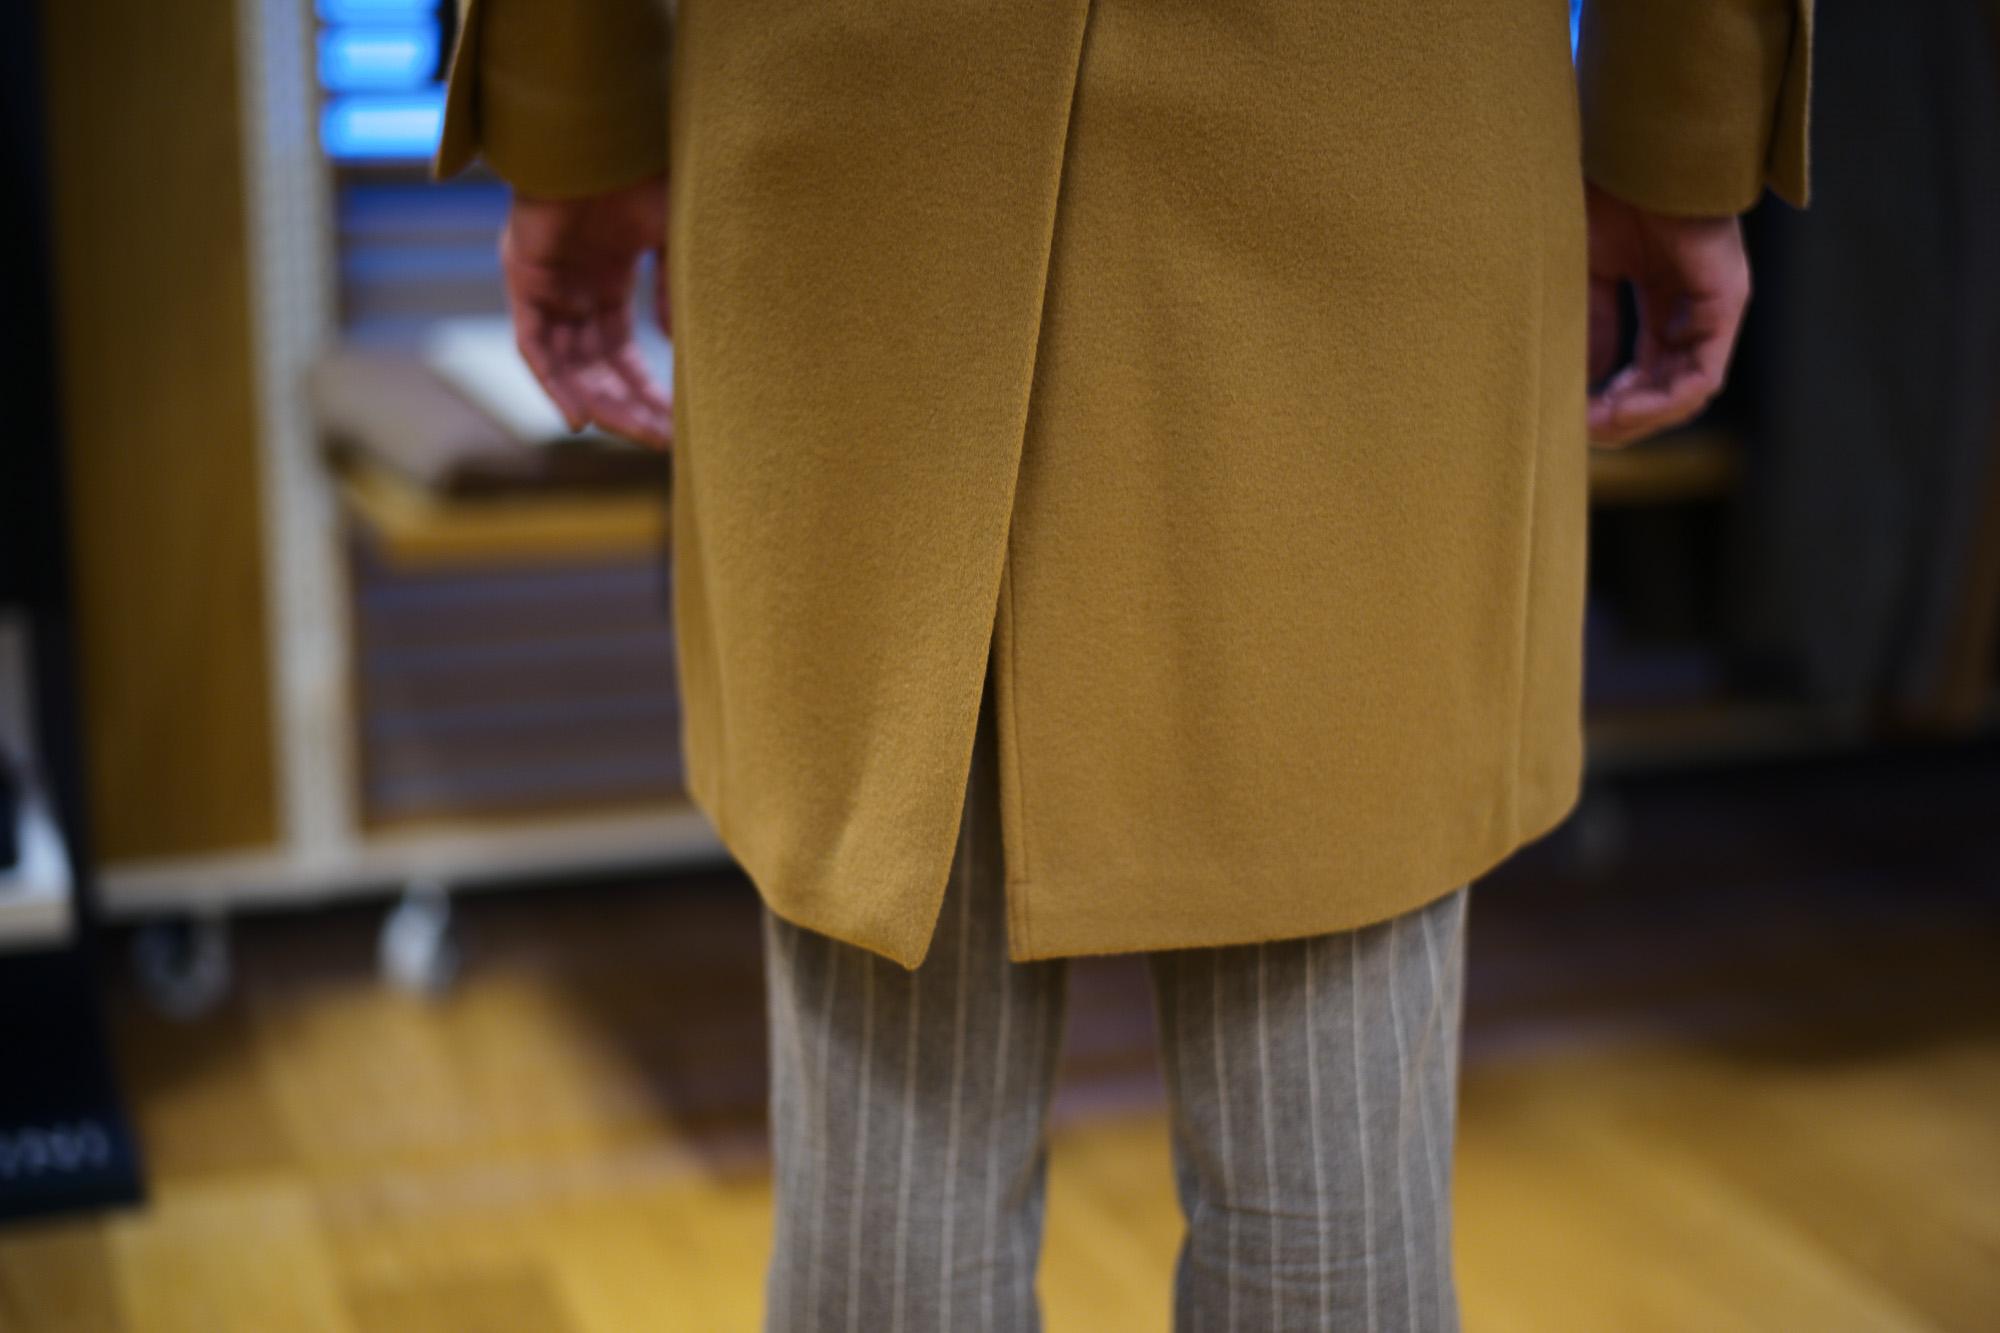 LARDINI / ラルディーニ (2018 秋冬 展示会) lardini スーツ ジャケット ルイジラルディーニ 愛知 名古屋 ZODIAC ゾディアック チェスターコート チェスター シングルチェスター ダブル コート